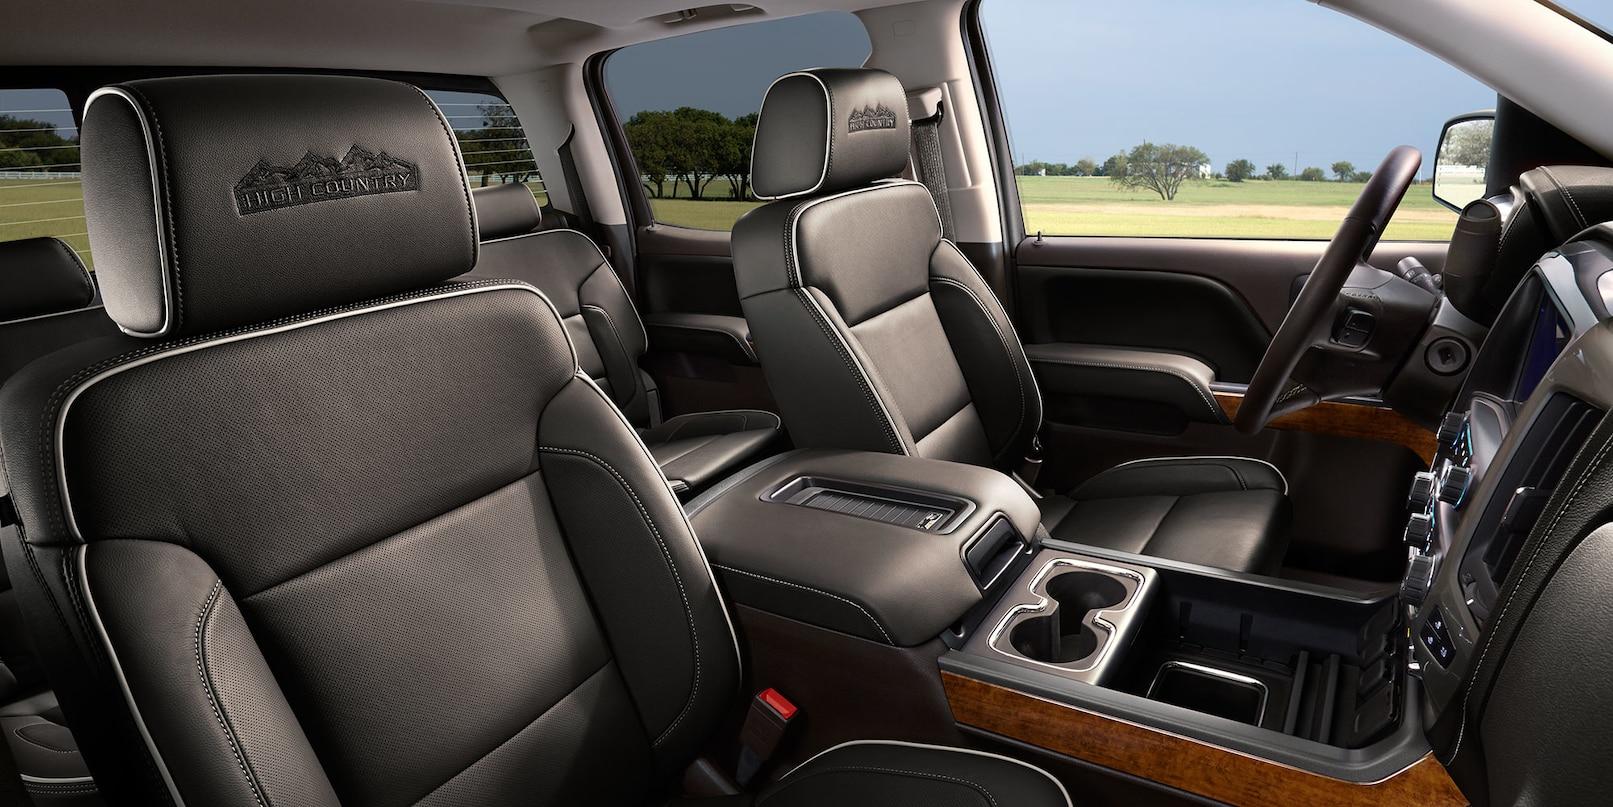 Enjoy Your Drives in the Silverado 1500